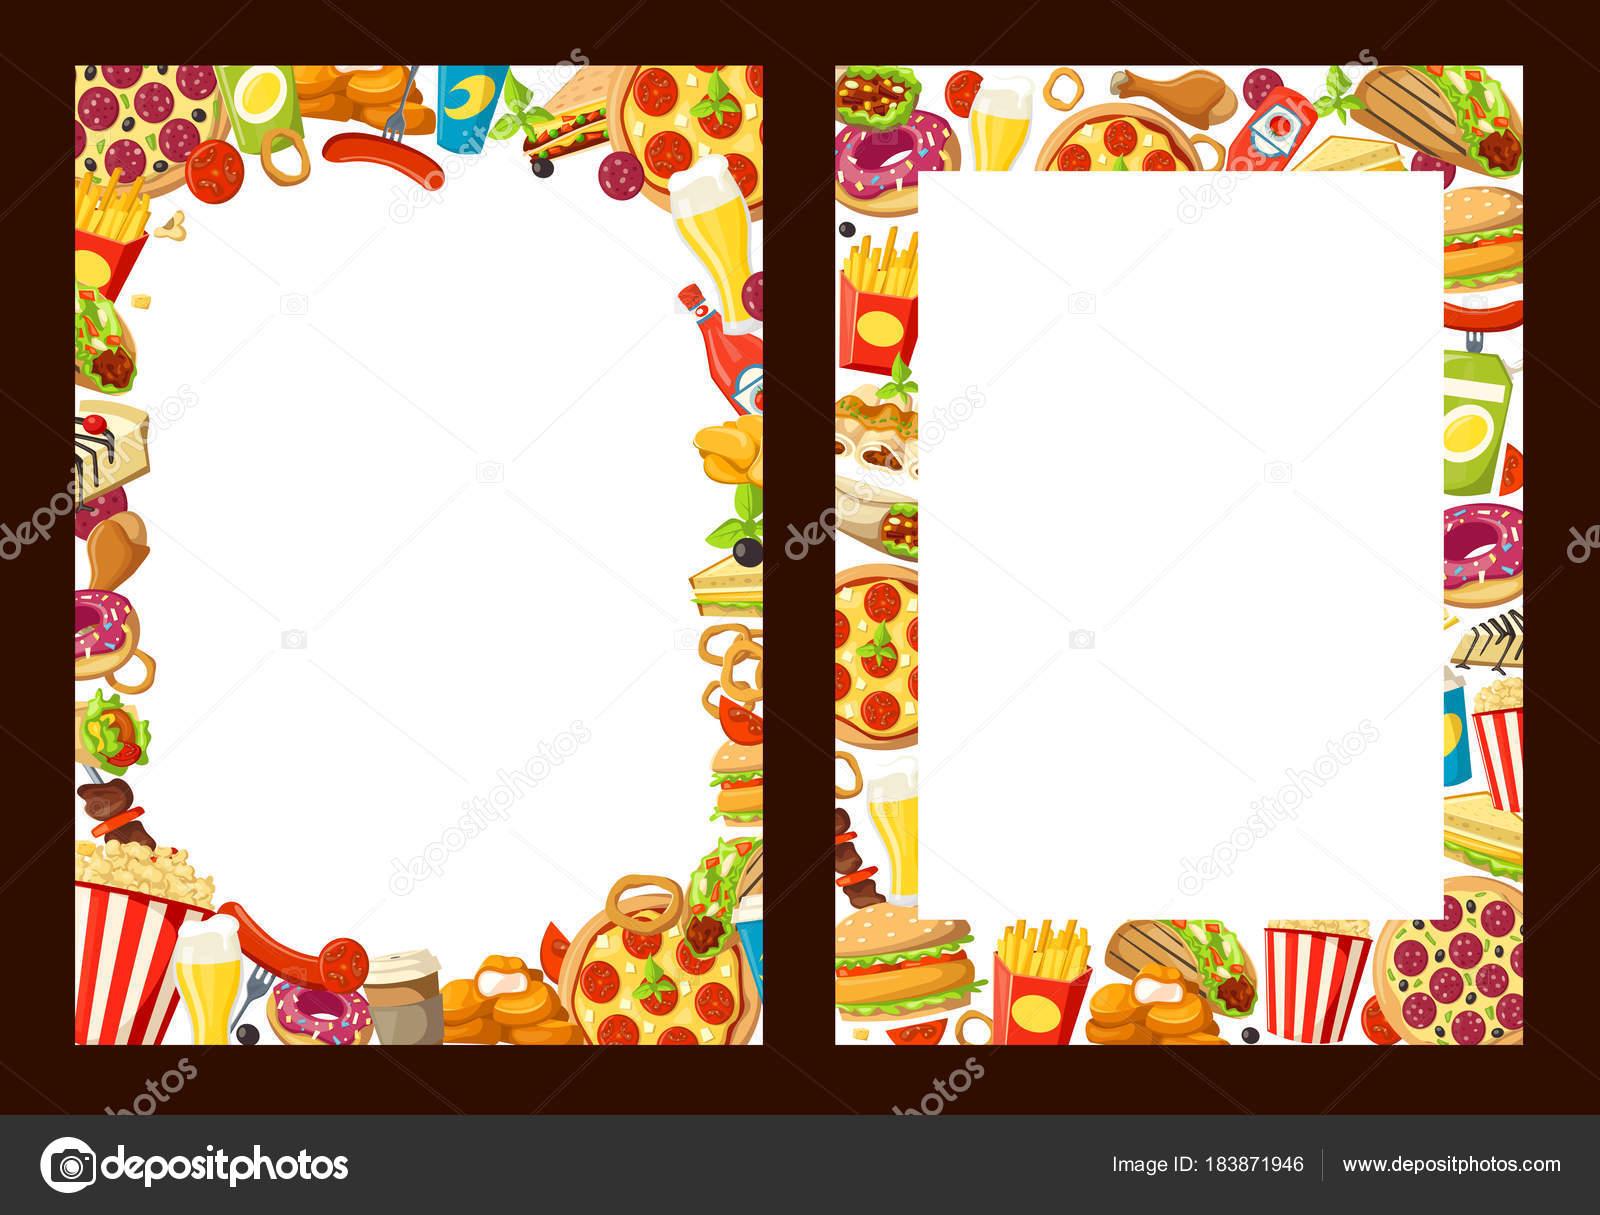 Vektor-Fast-Food-Menü-Vorlagen — Stockvektor © Seamartini #183871946